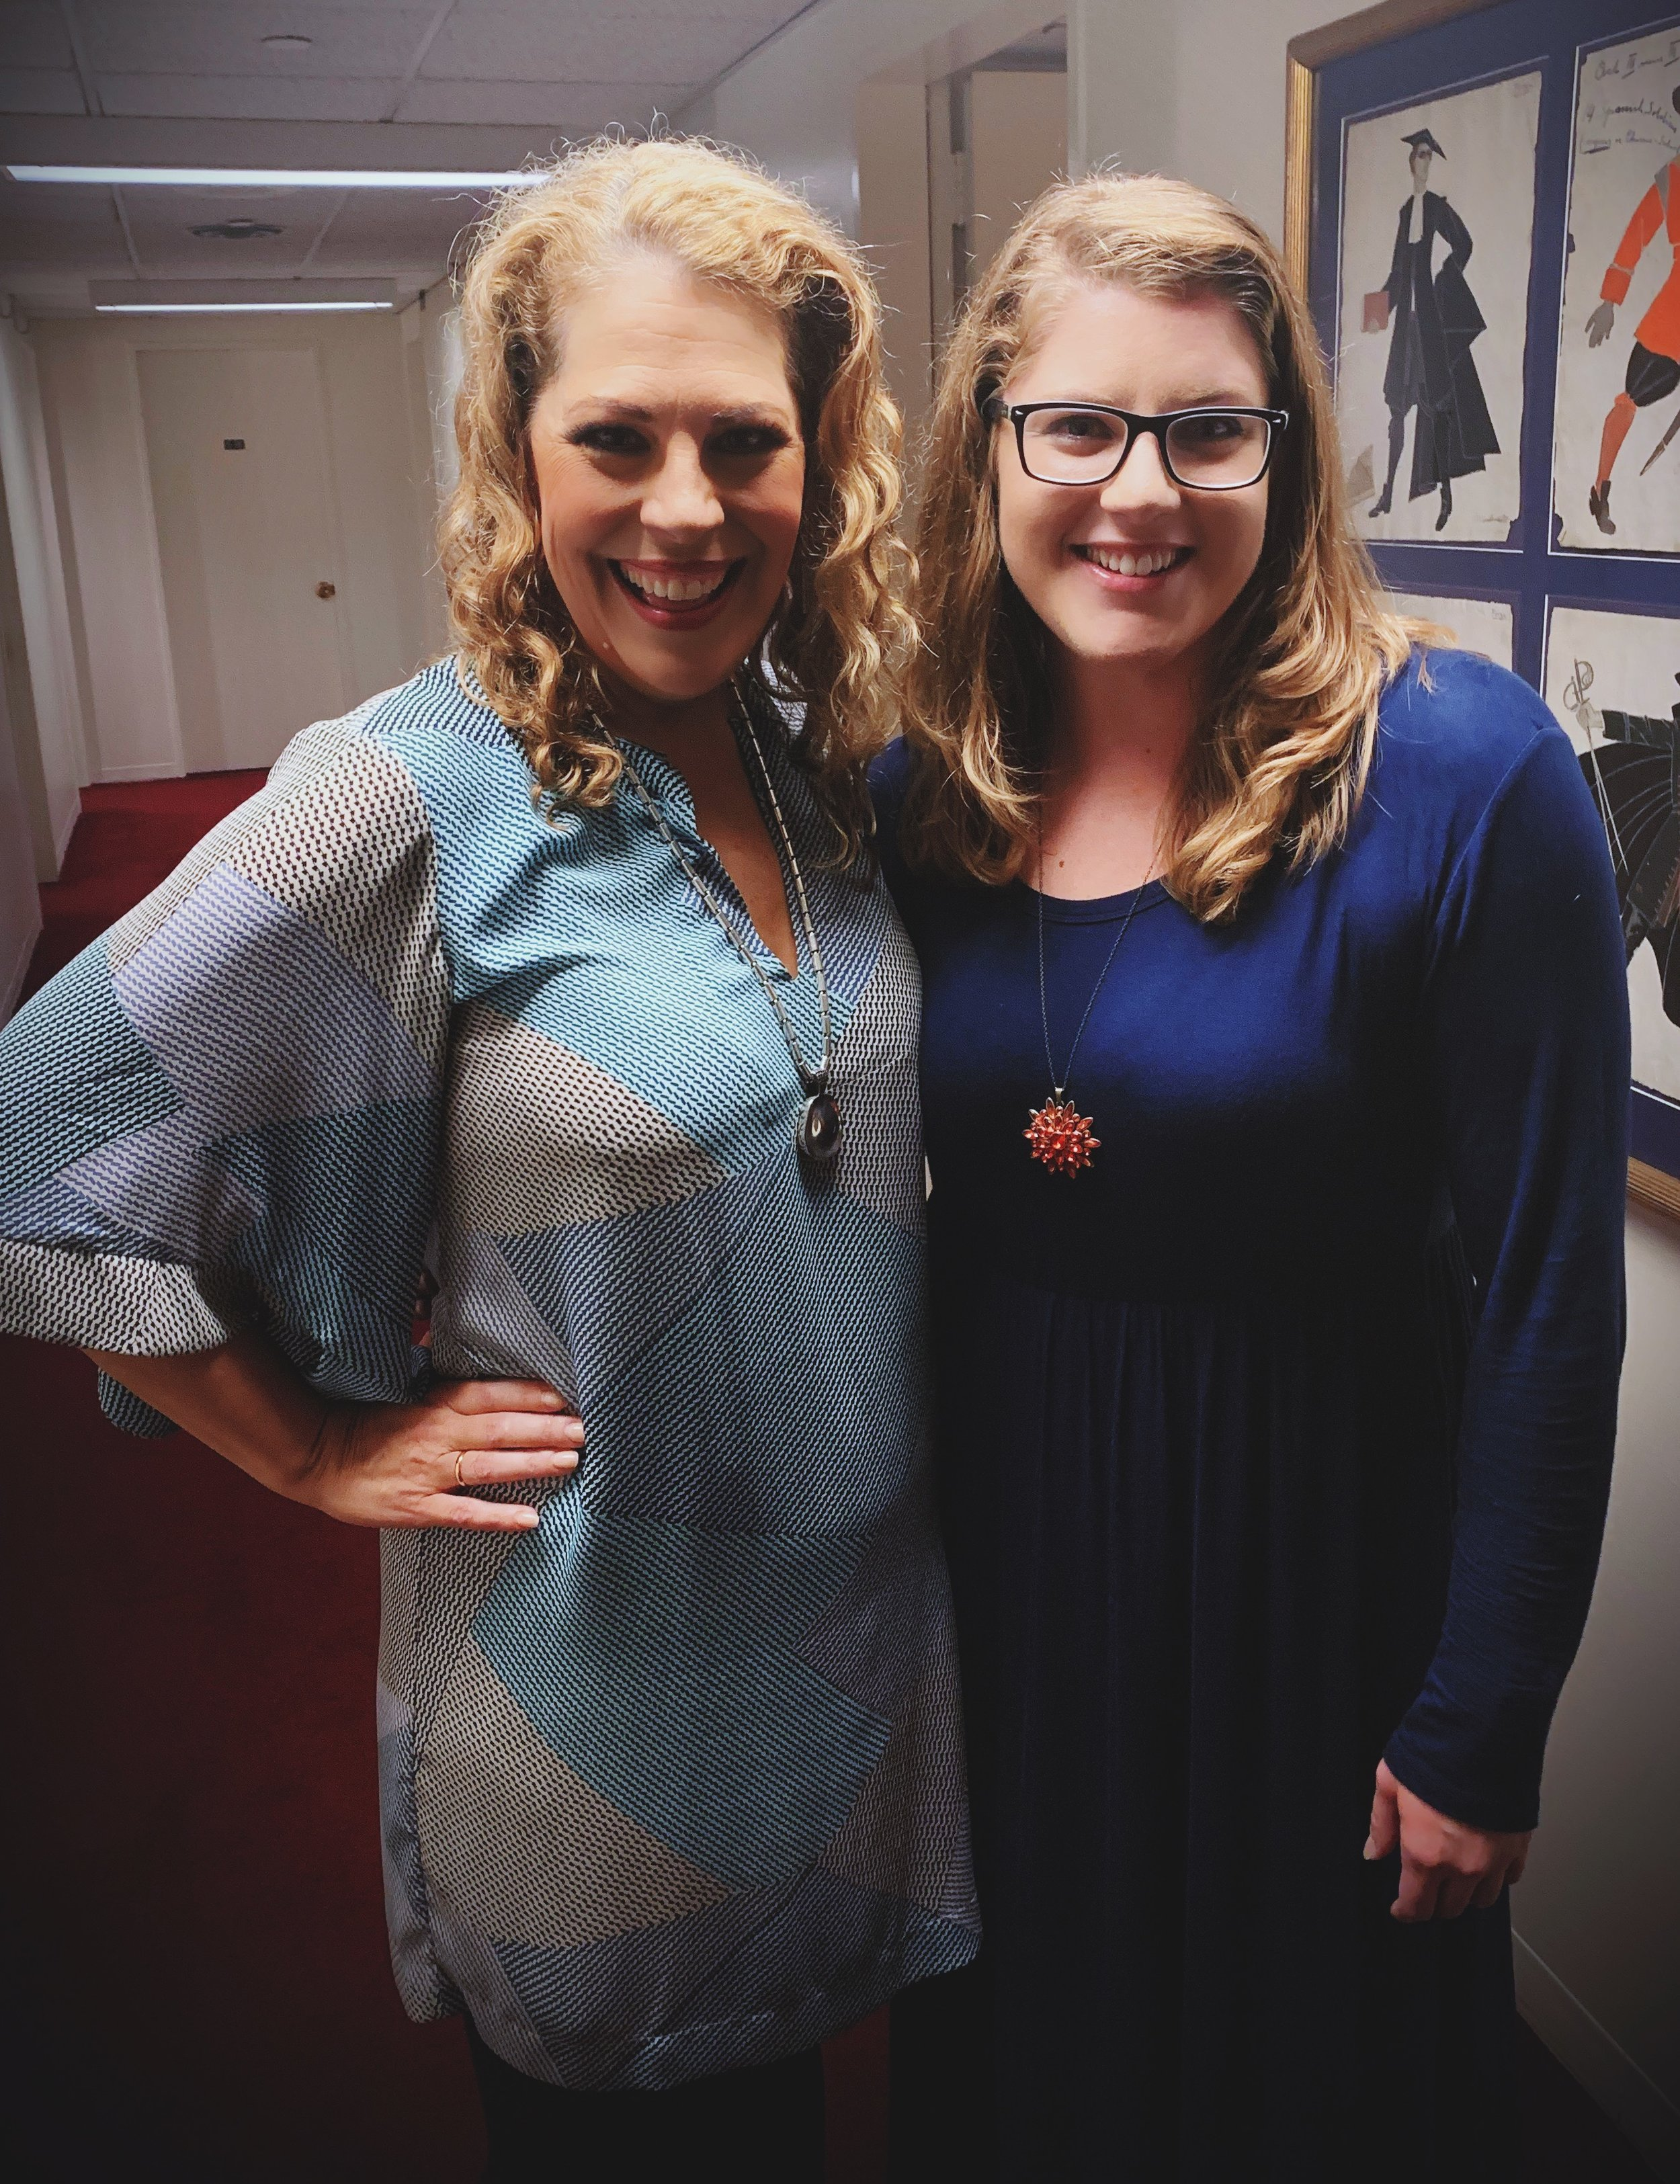 Backstage with Sondra